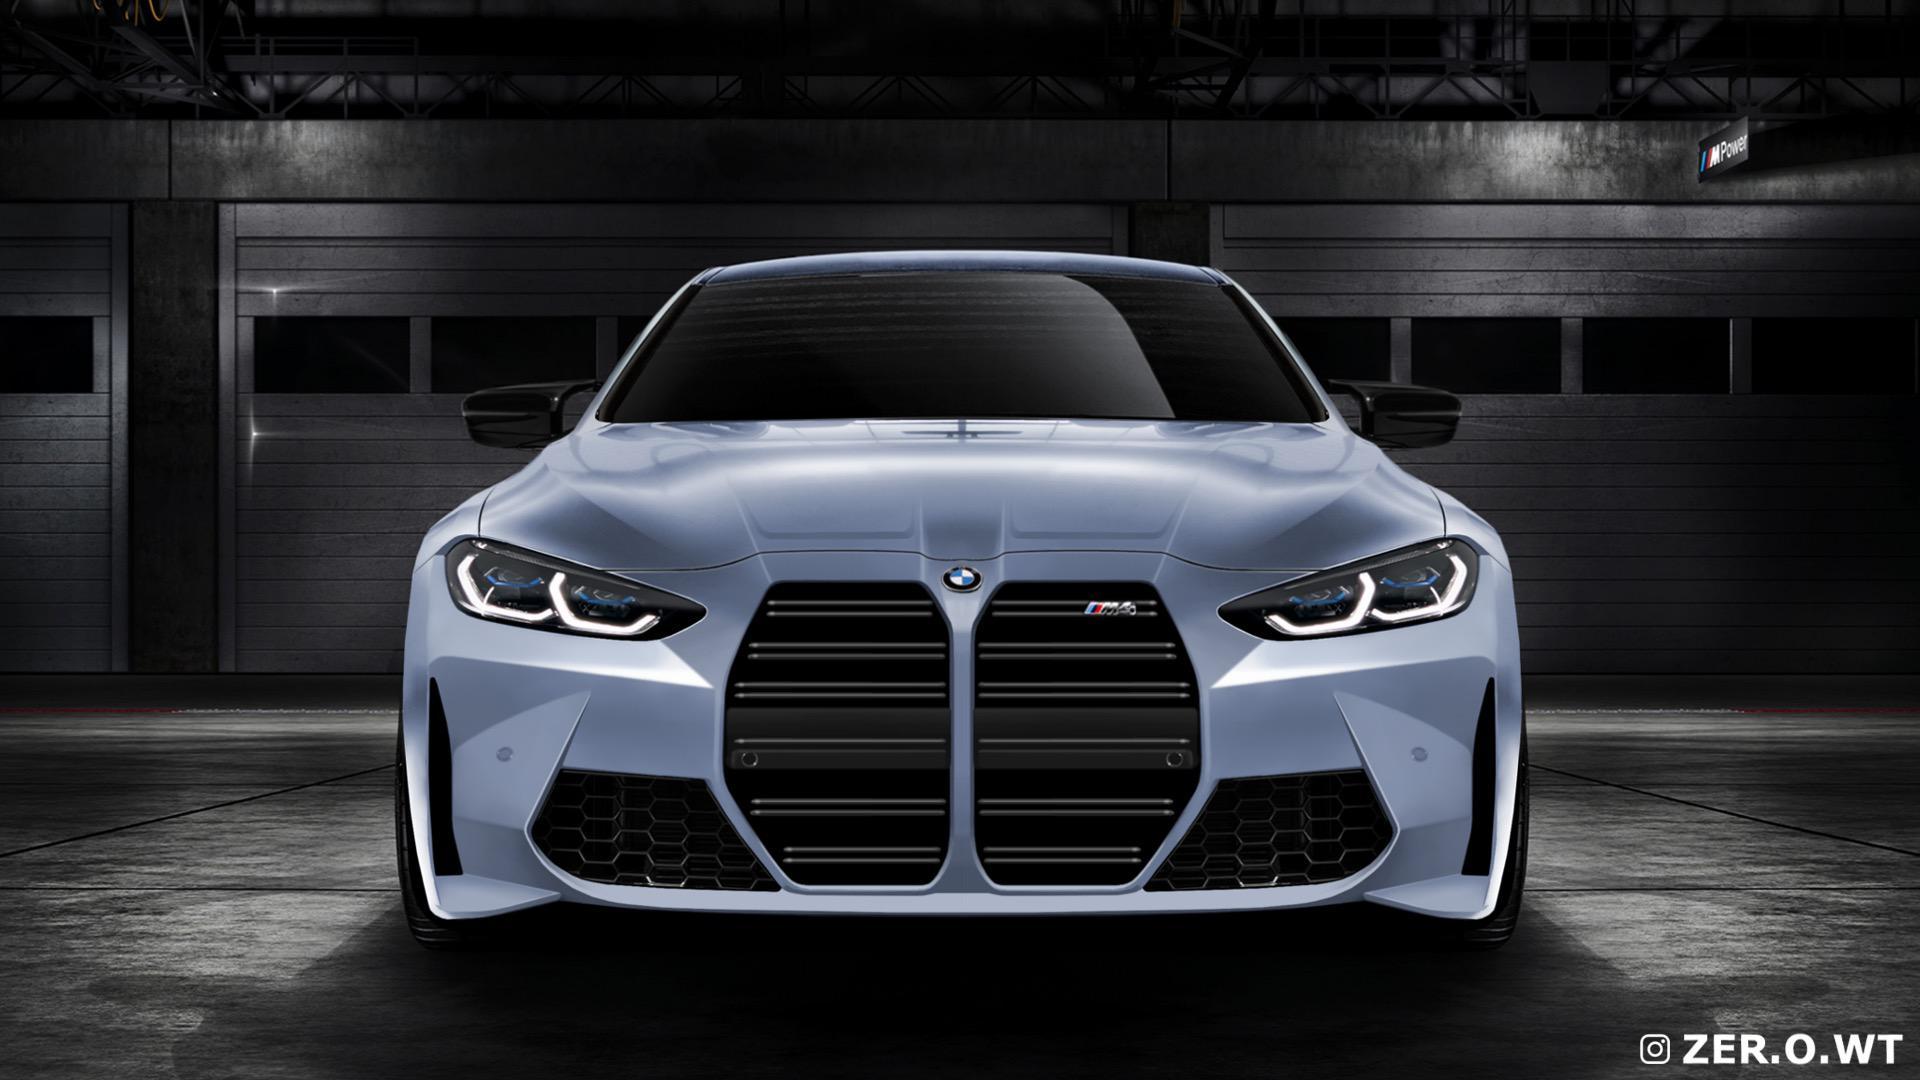 2021 BMW M4 G82 photoshopt front